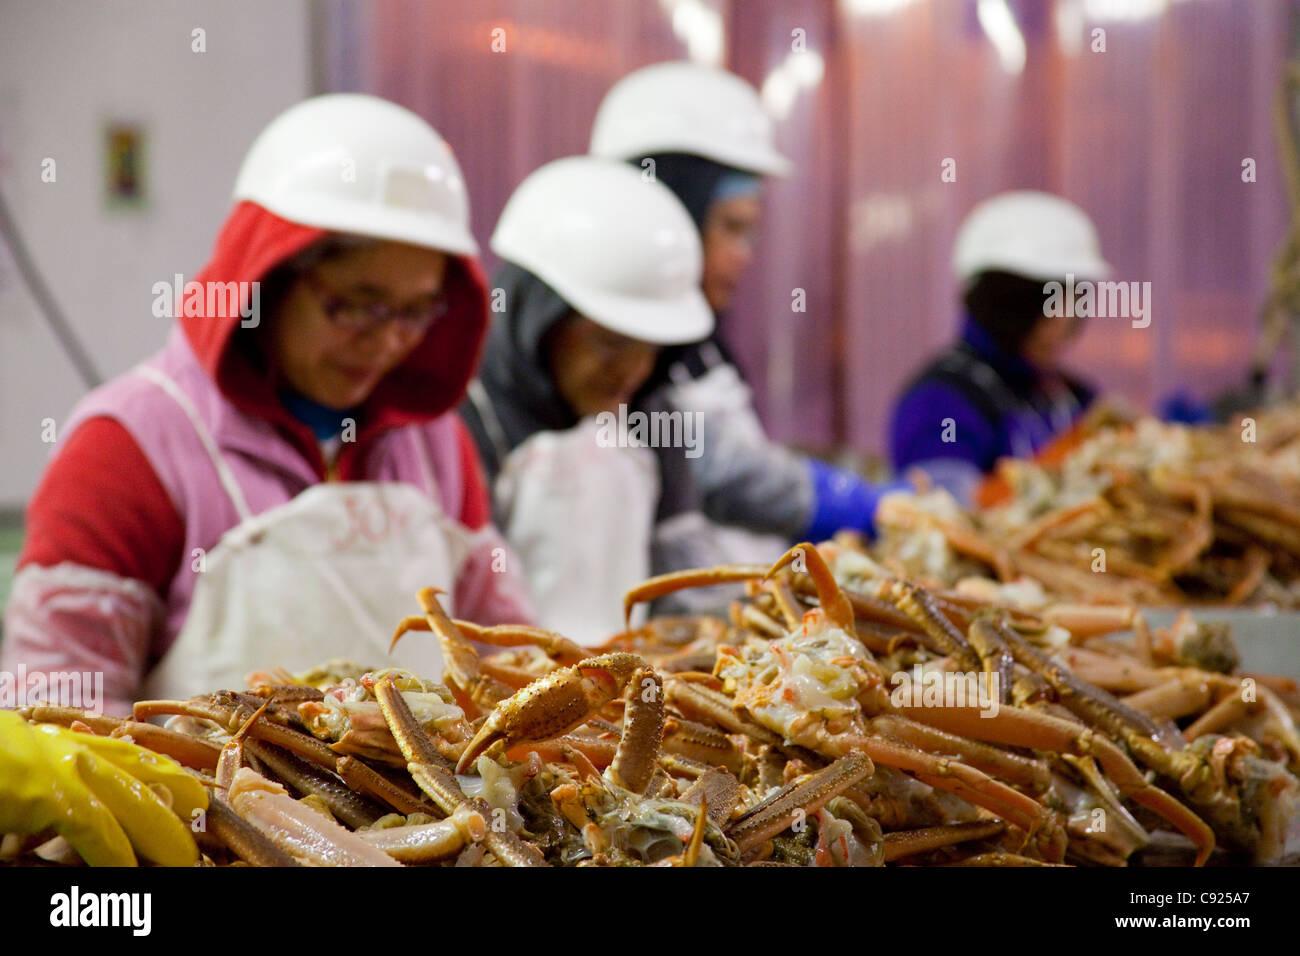 Konservenfabrik Arbeiter Prozess Tanner Krabben auf dem Slime-Line auf Kodiak, Südwesten, Alaska, Alaska frische Stockbild